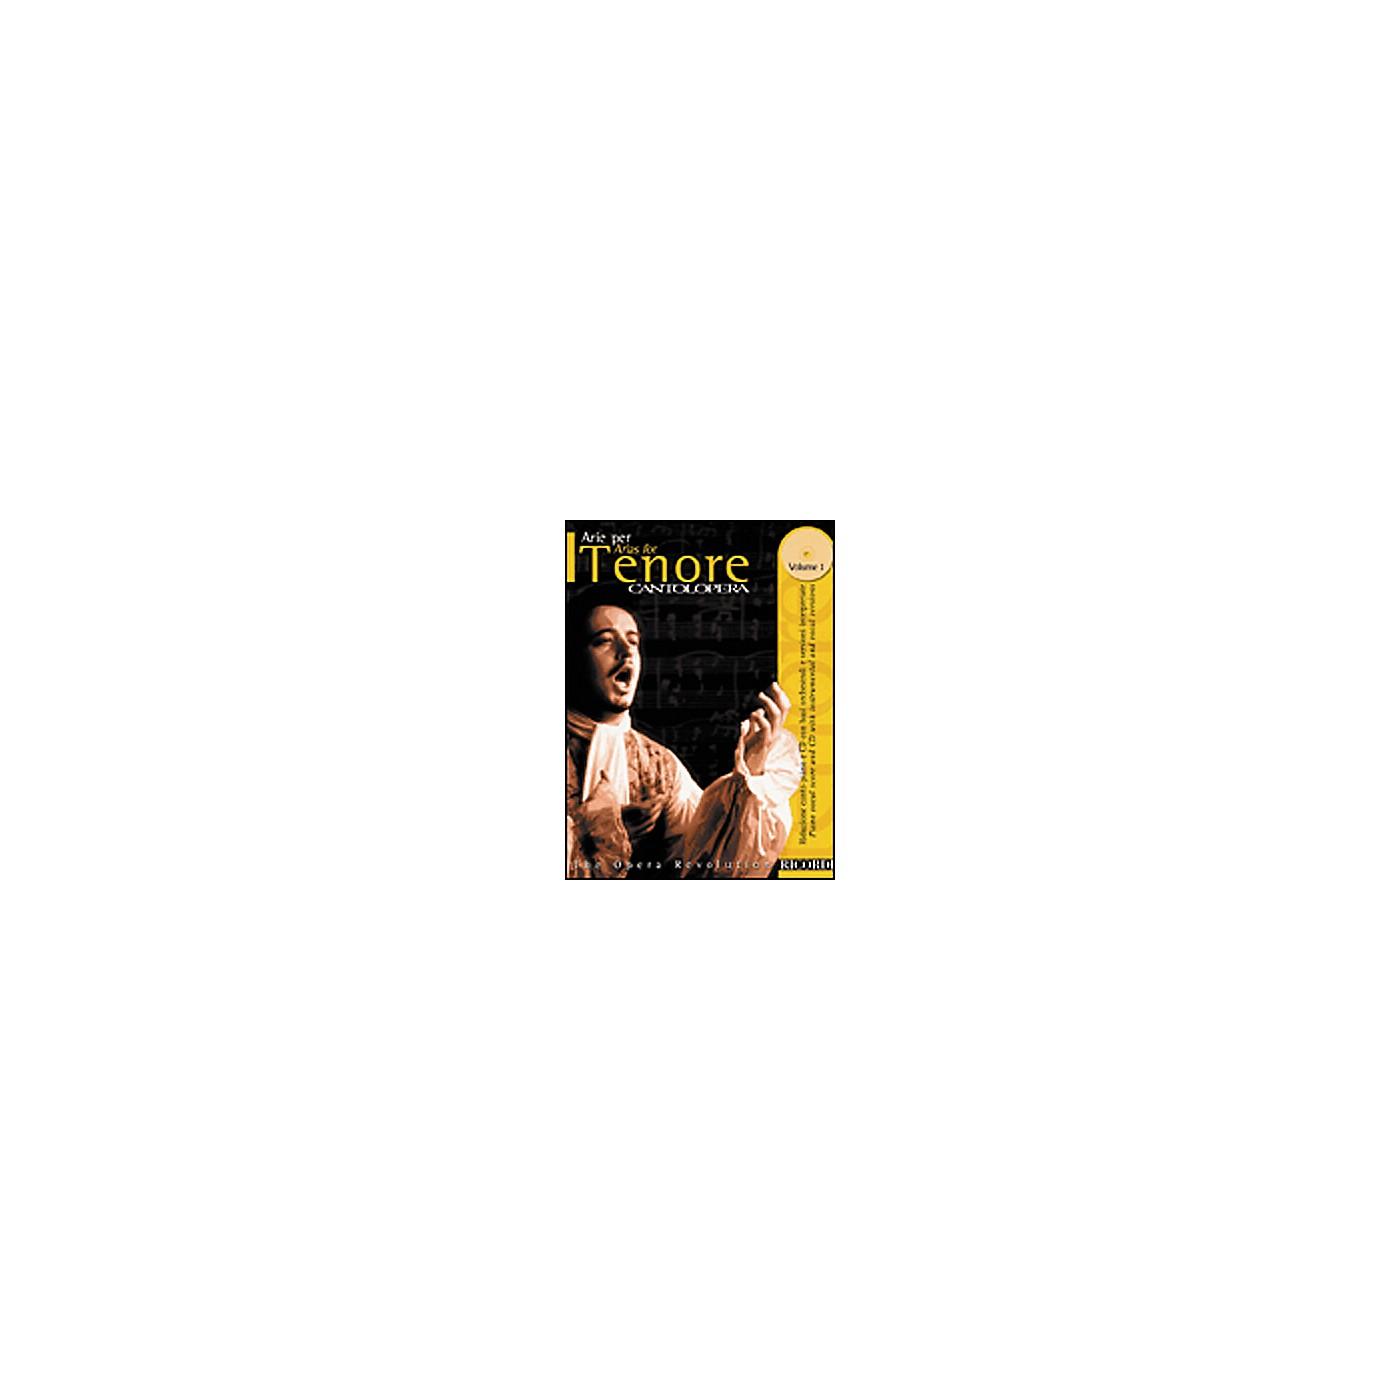 Hal Leonard Cantolopera Arias for Tenor - Volume 1 Book/CD thumbnail